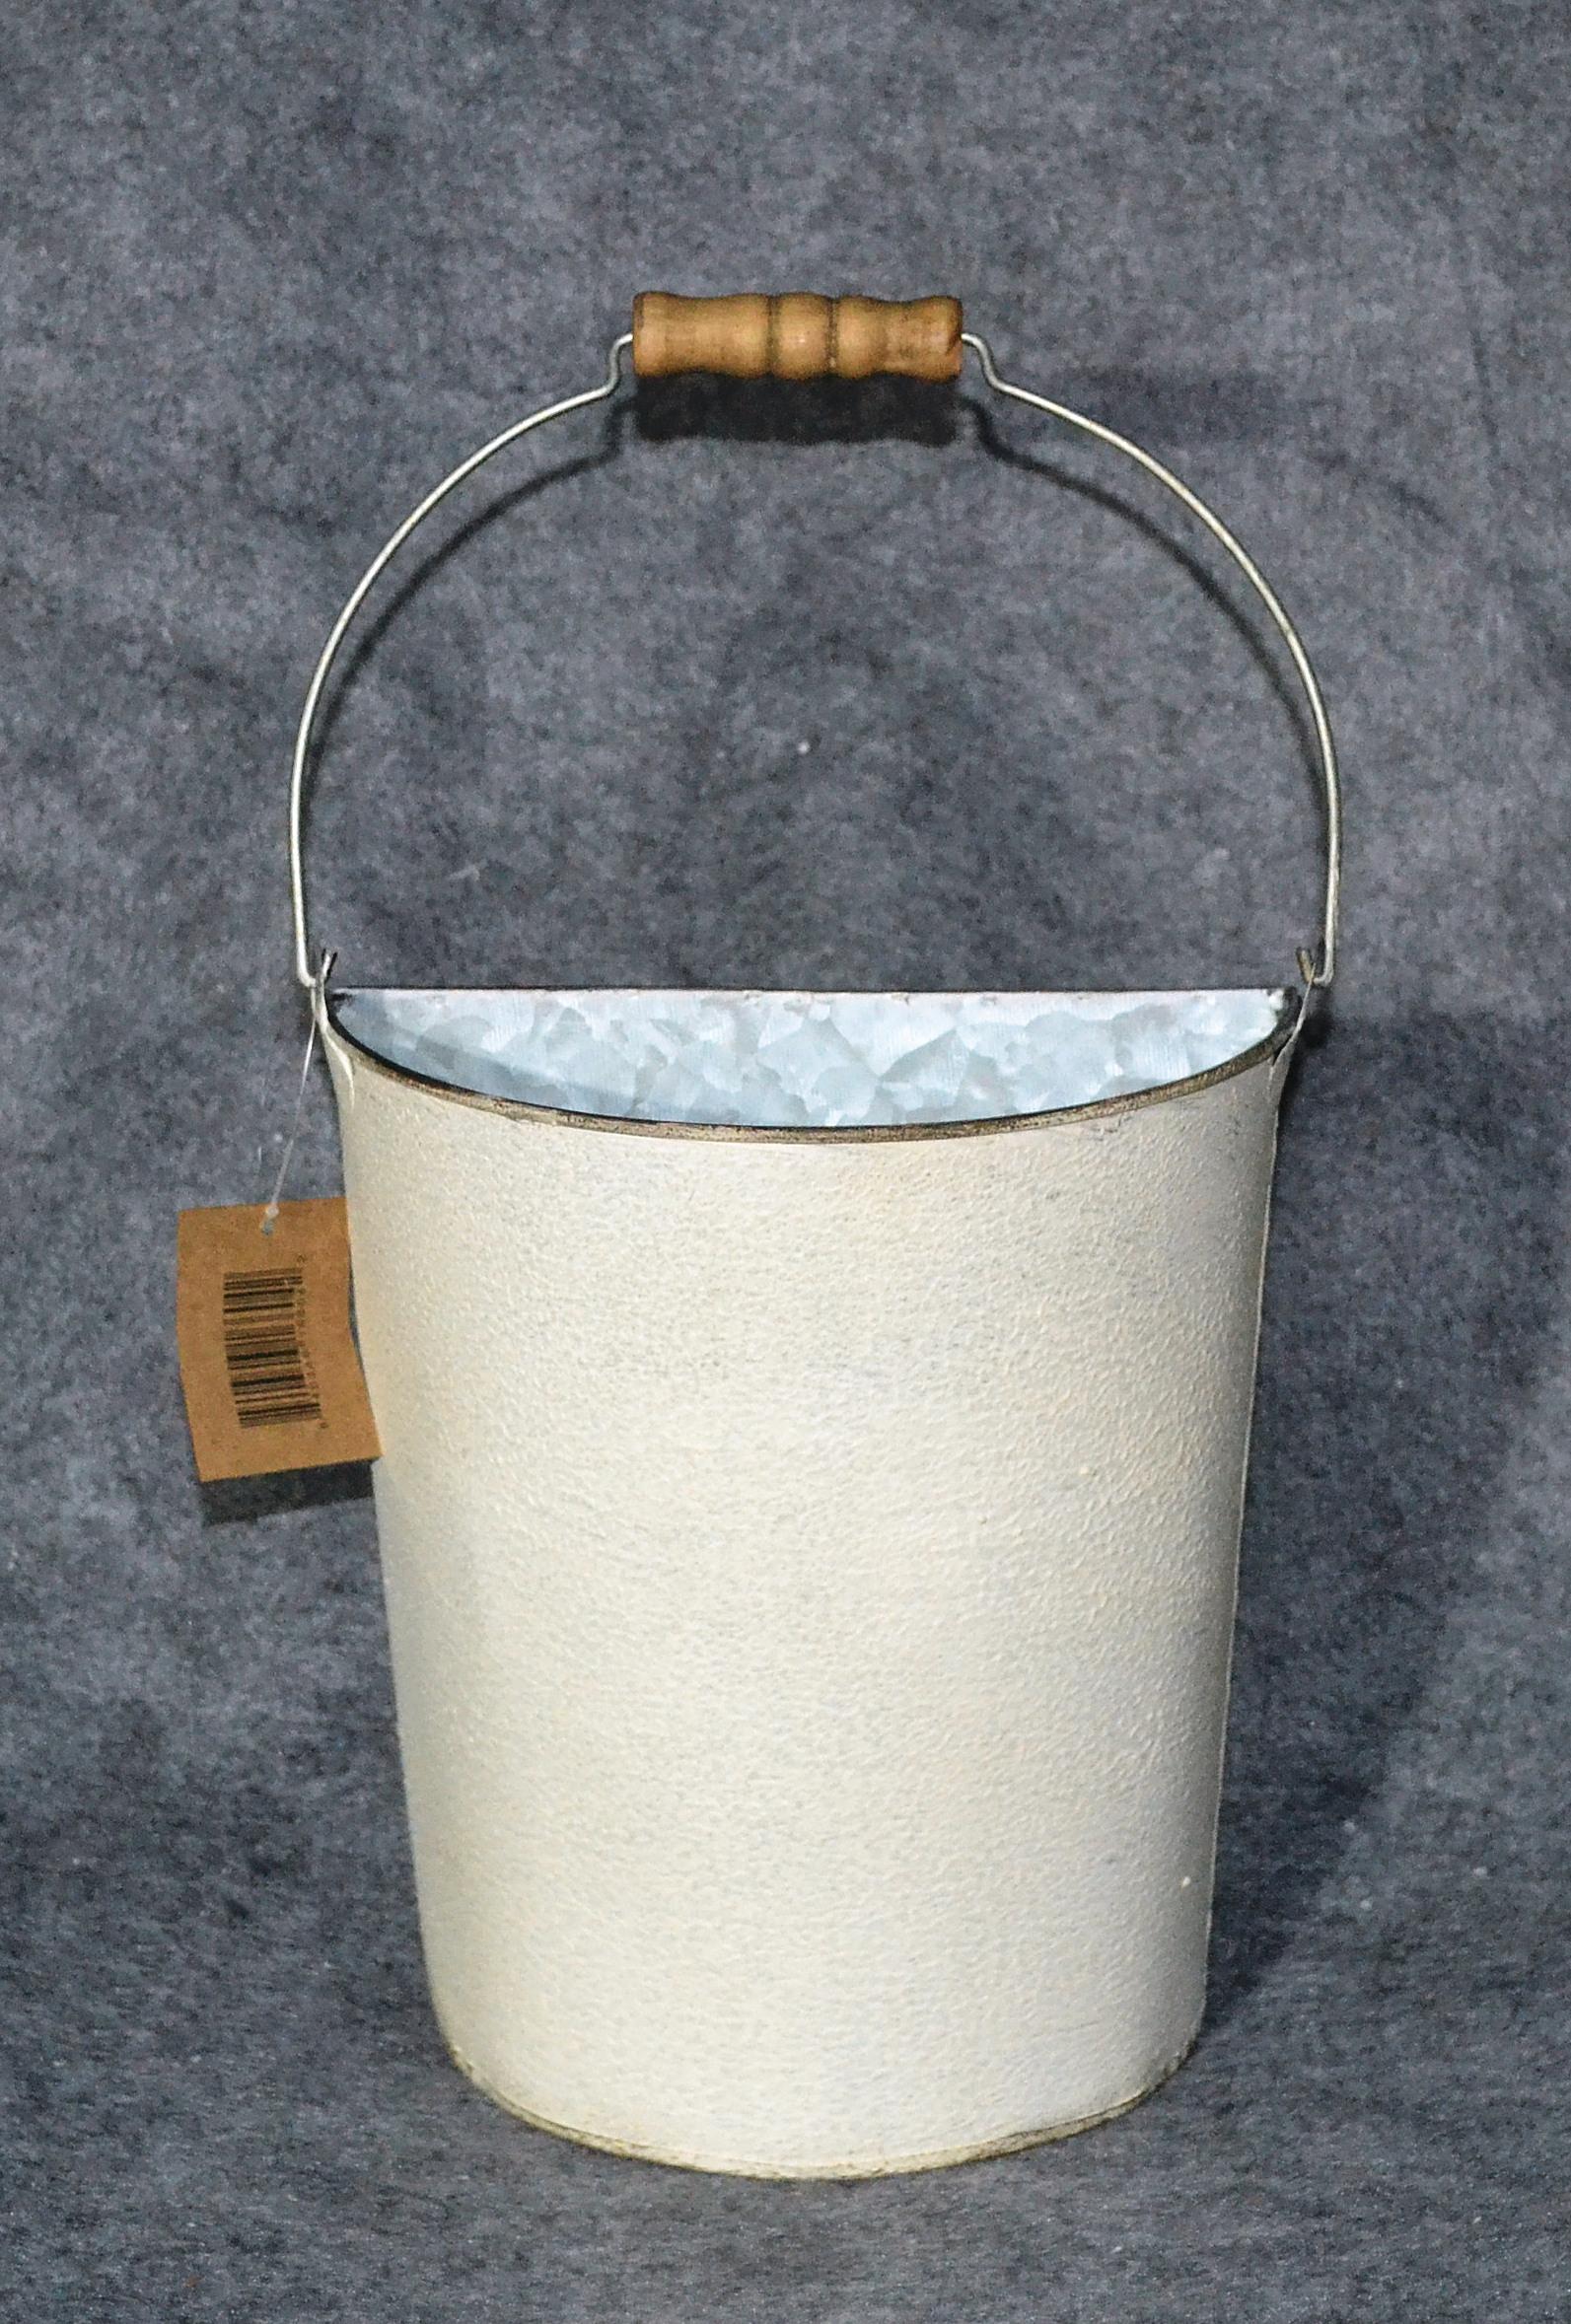 metal-white-metal-wall-bucket-mxf09095.jpg